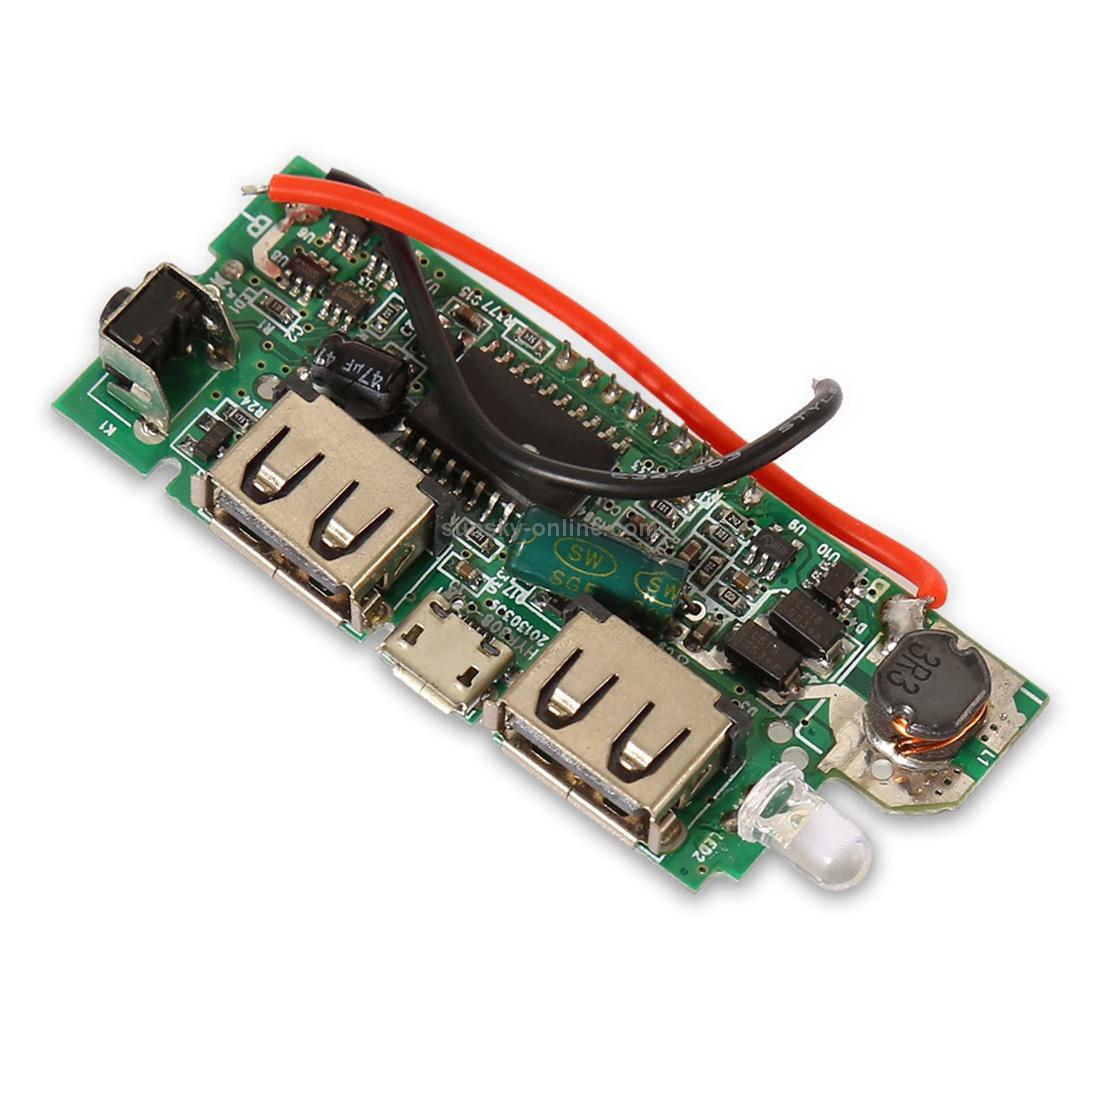 SUNSKY - Dual USB Mobile Power Bank DIY Battery Charger PCB